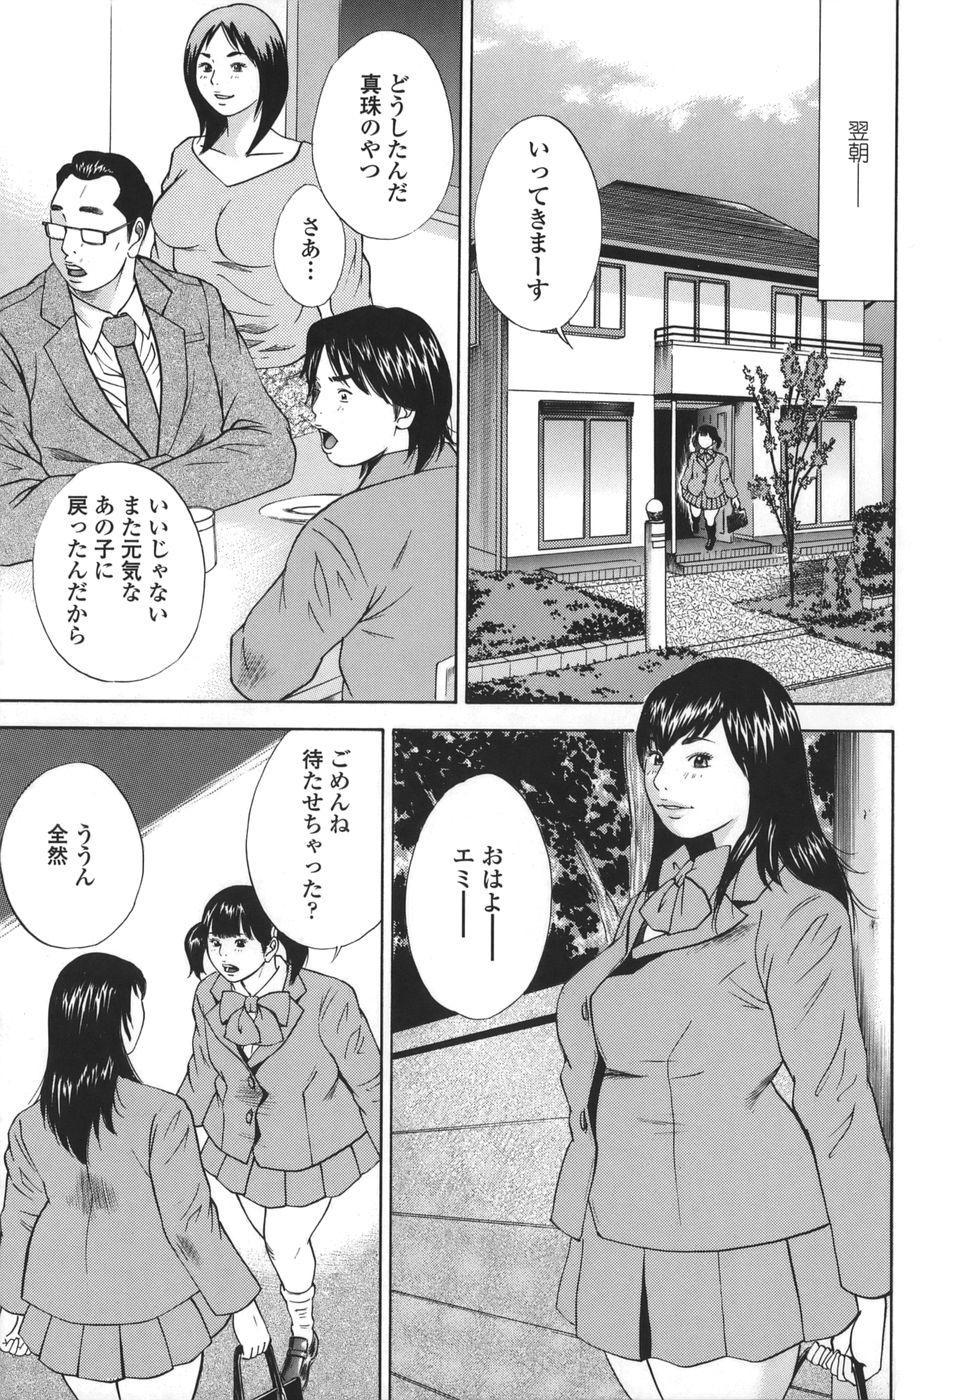 Kinshin Goukan - Near Relation Rapes 164